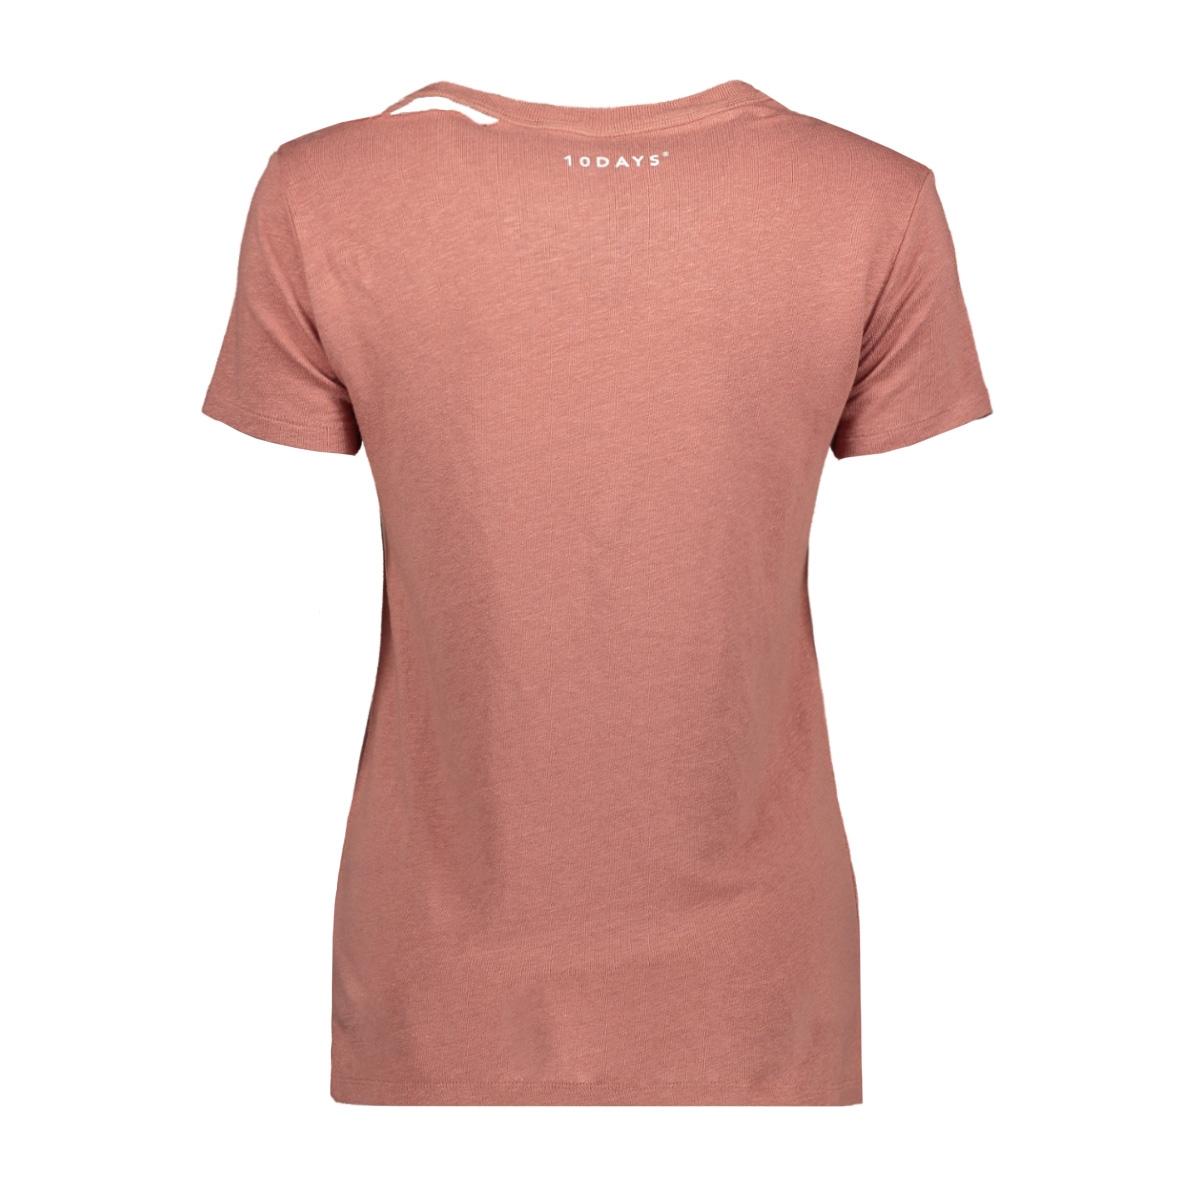 20 752 9101 10 days t-shirt rose